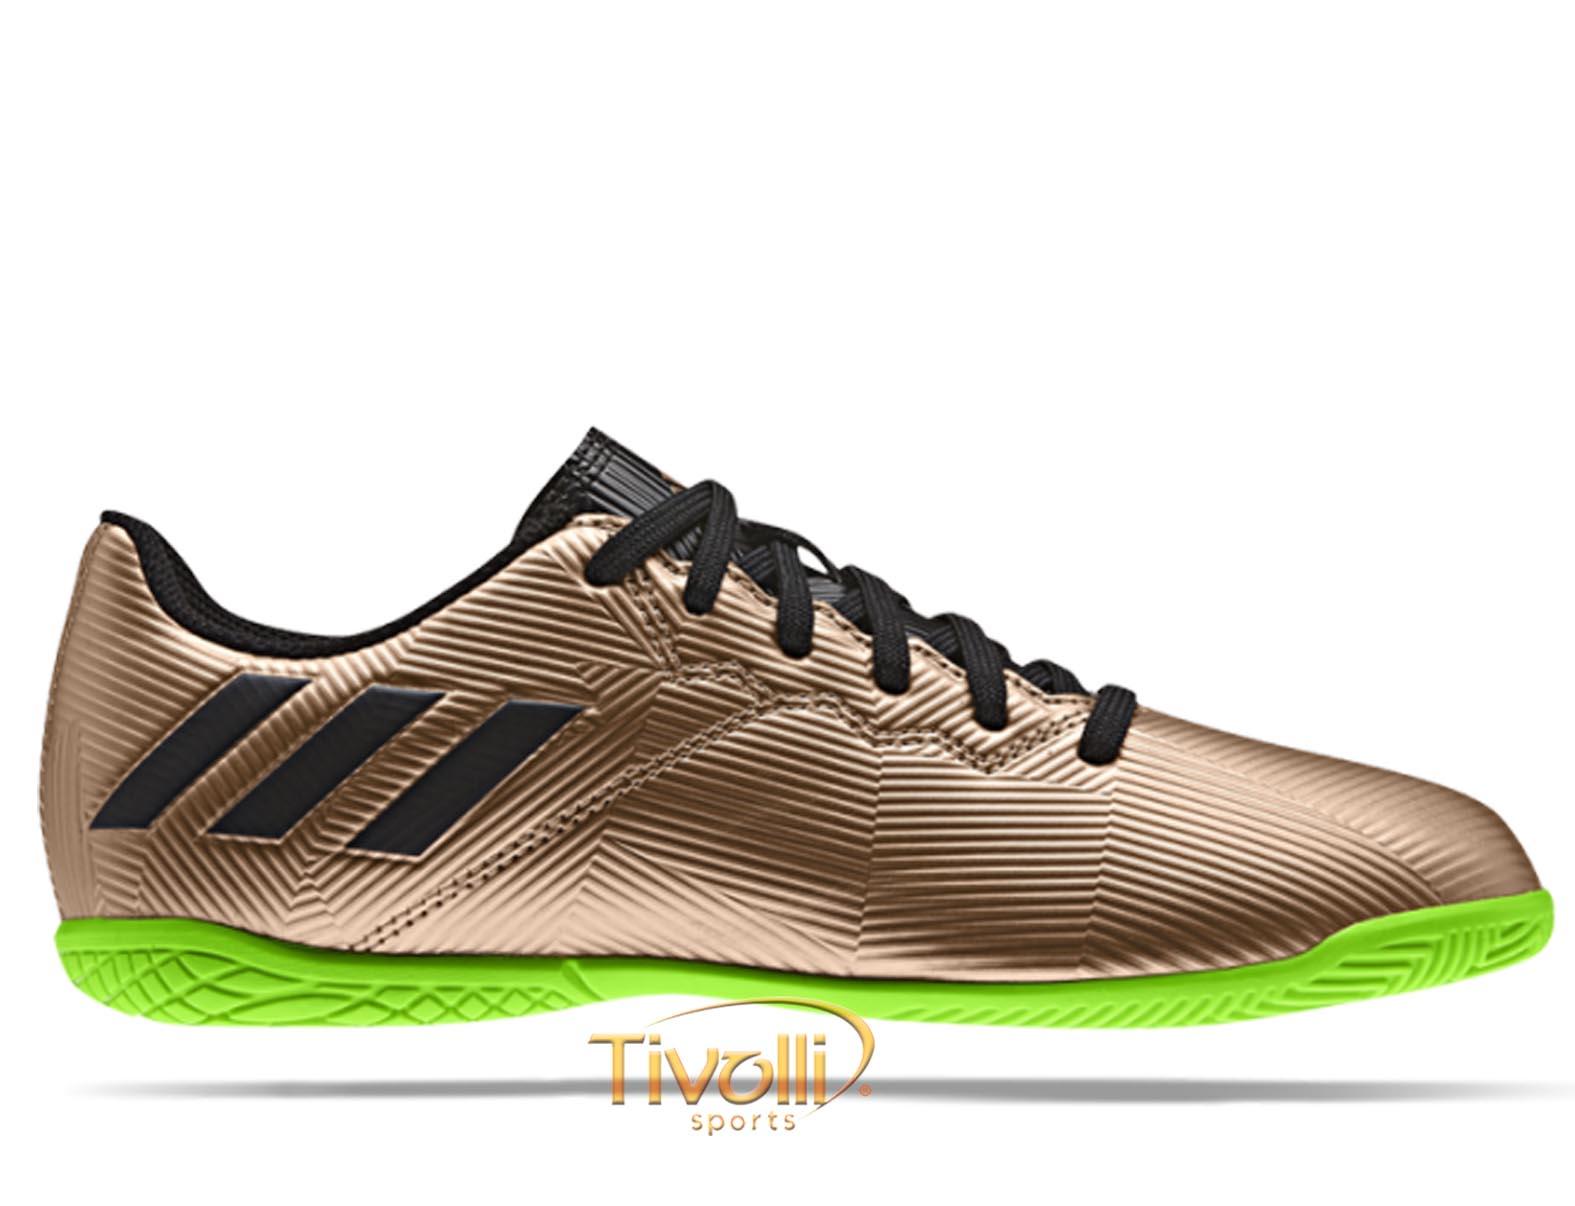 Chuteira Adidas Messi 16.4 IC Futsal Infantil   Dourada 23f3f96b2344d